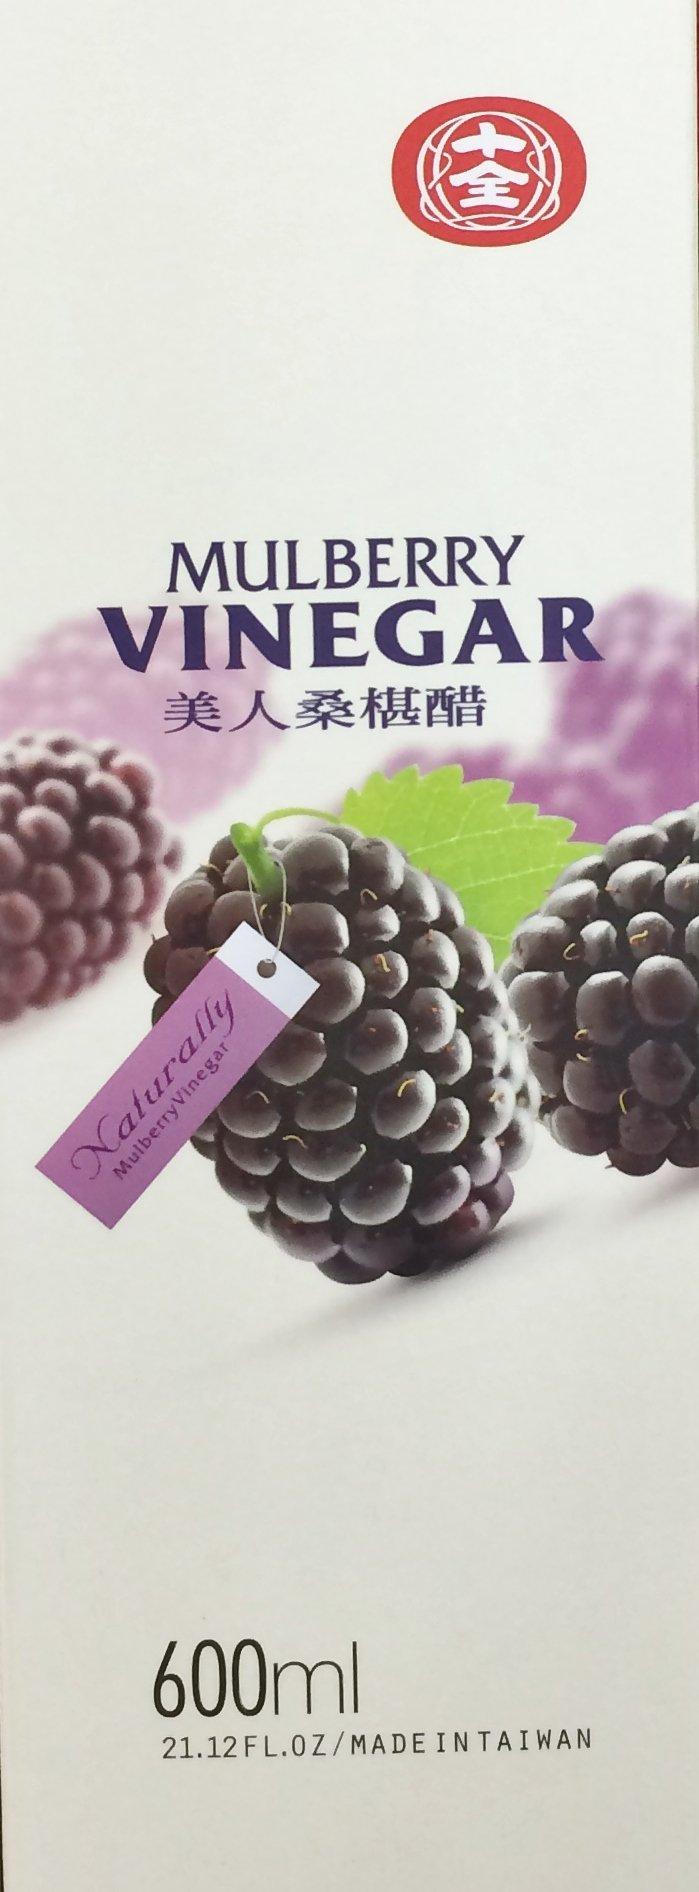 21.12oz Mulberry Vinegar by Shih Chuan Taiwan (One Box)